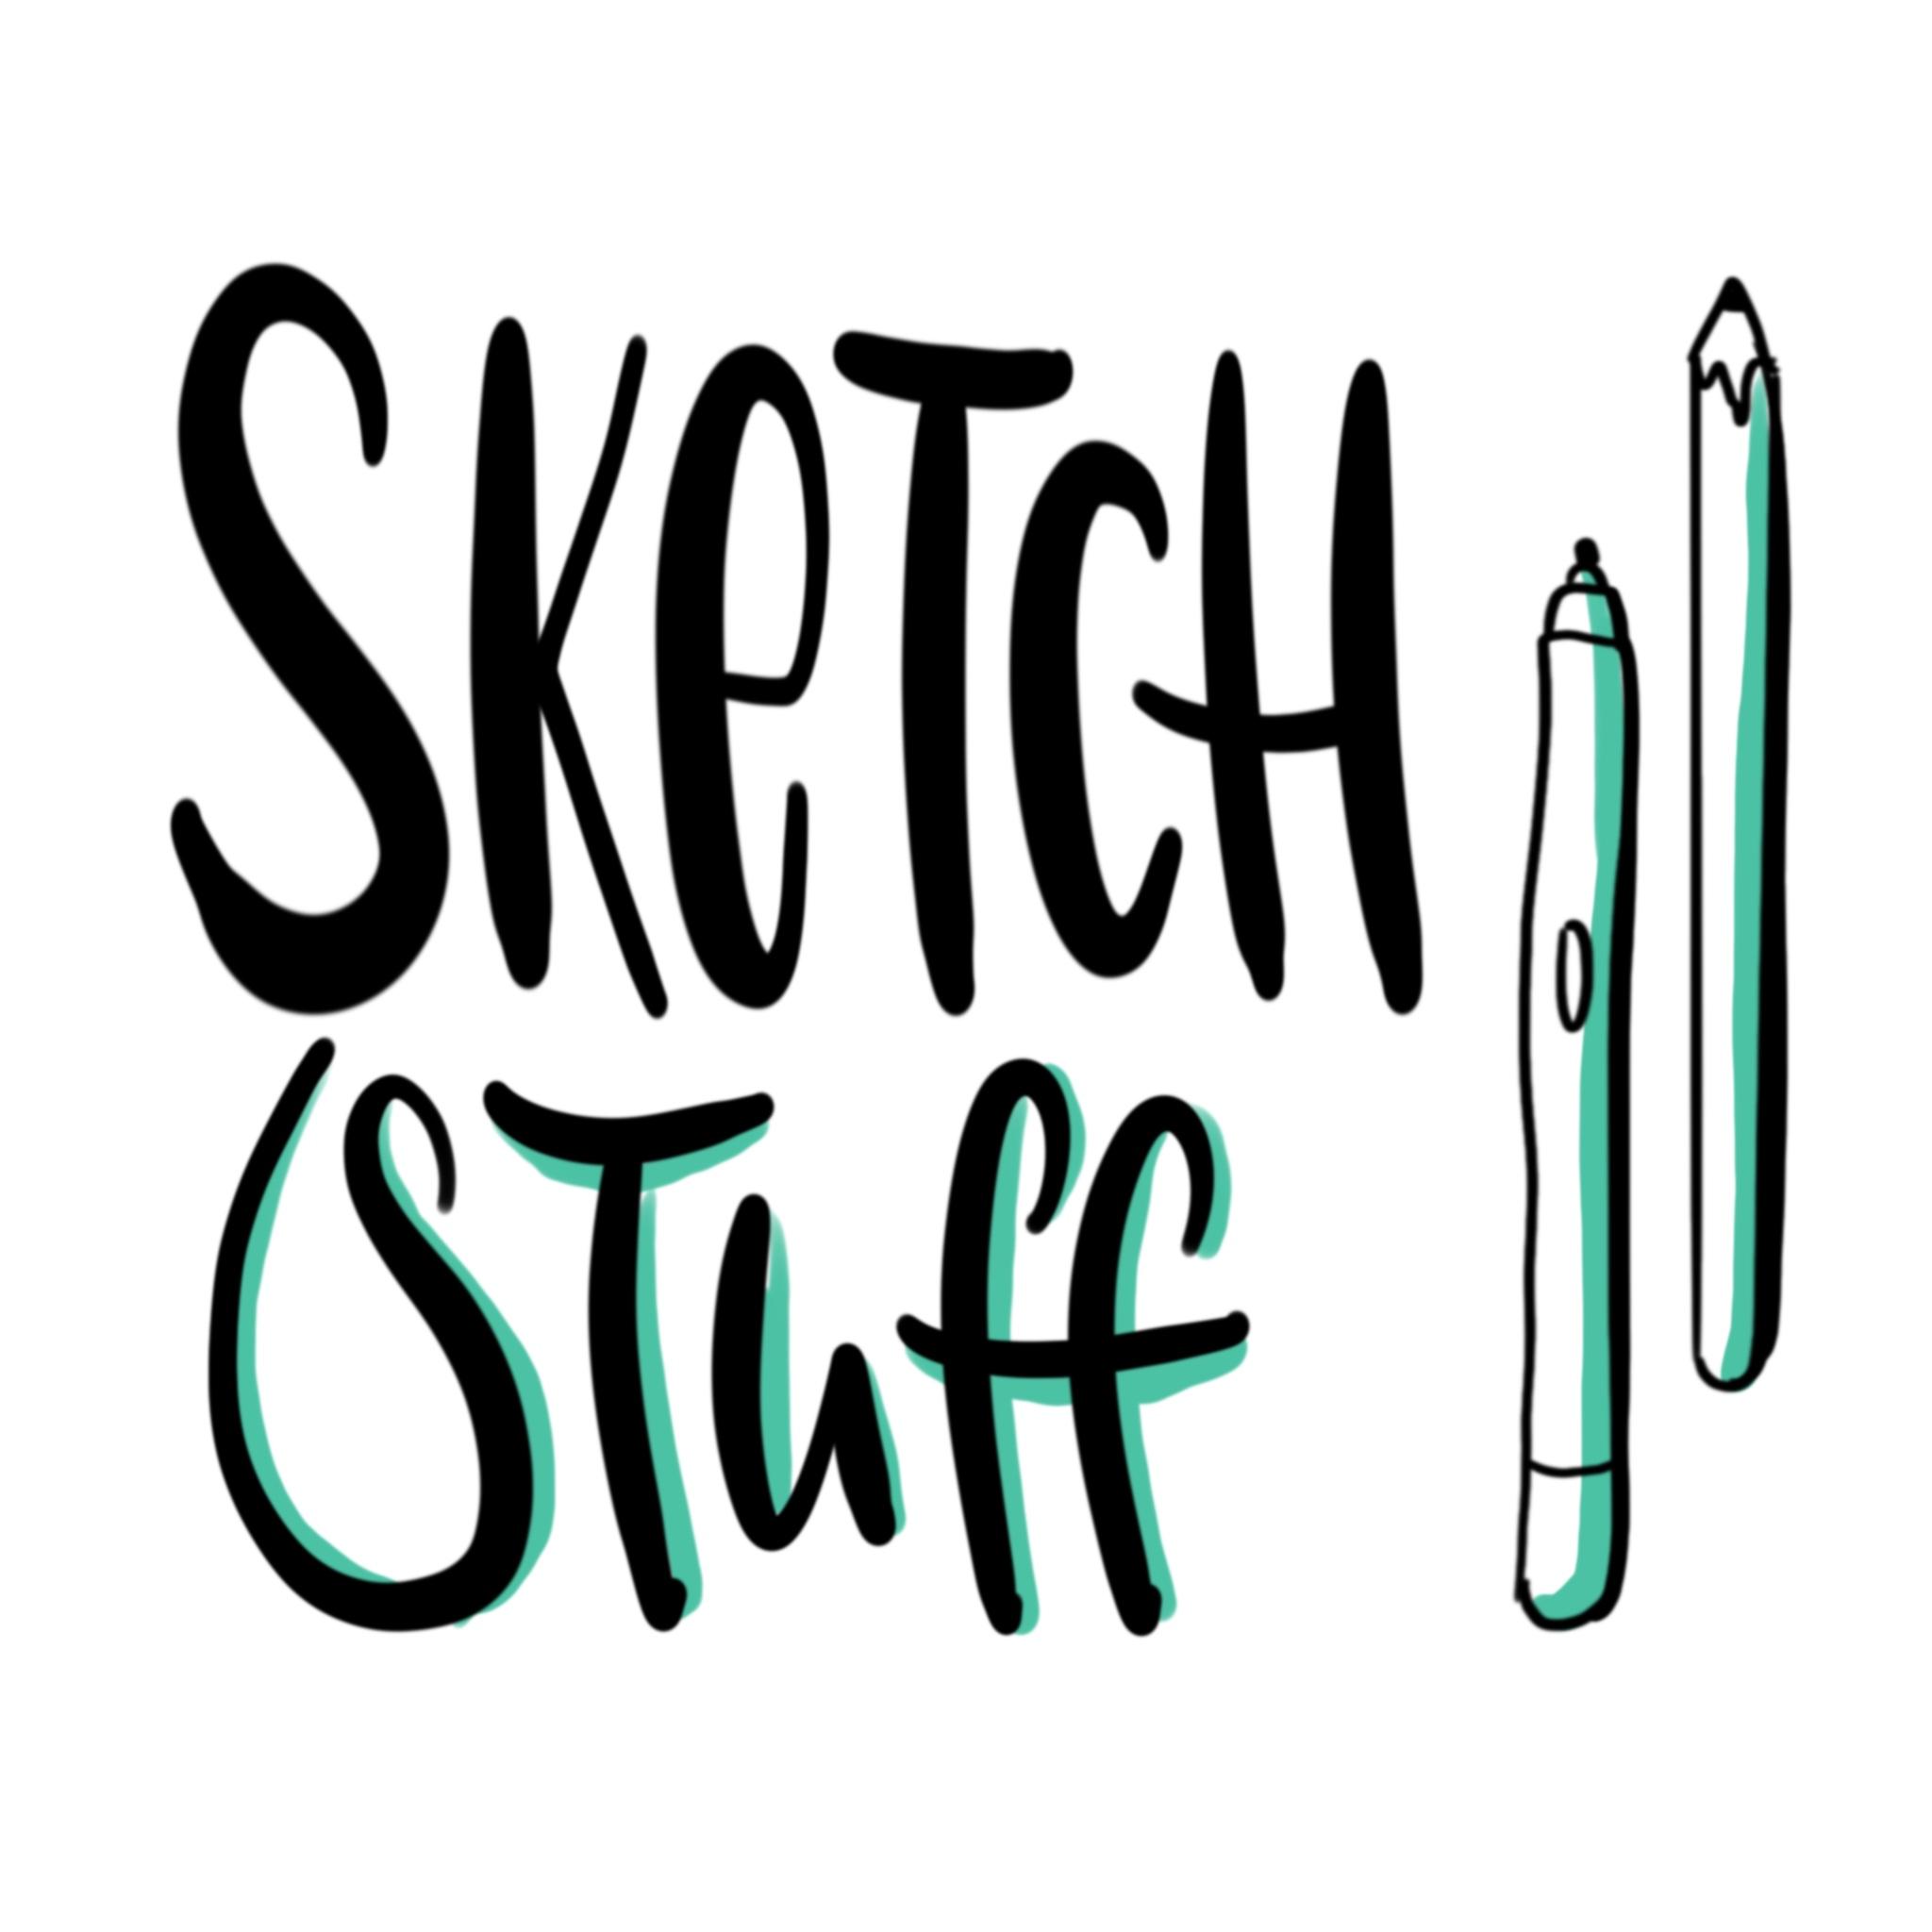 Sketch-Stuff